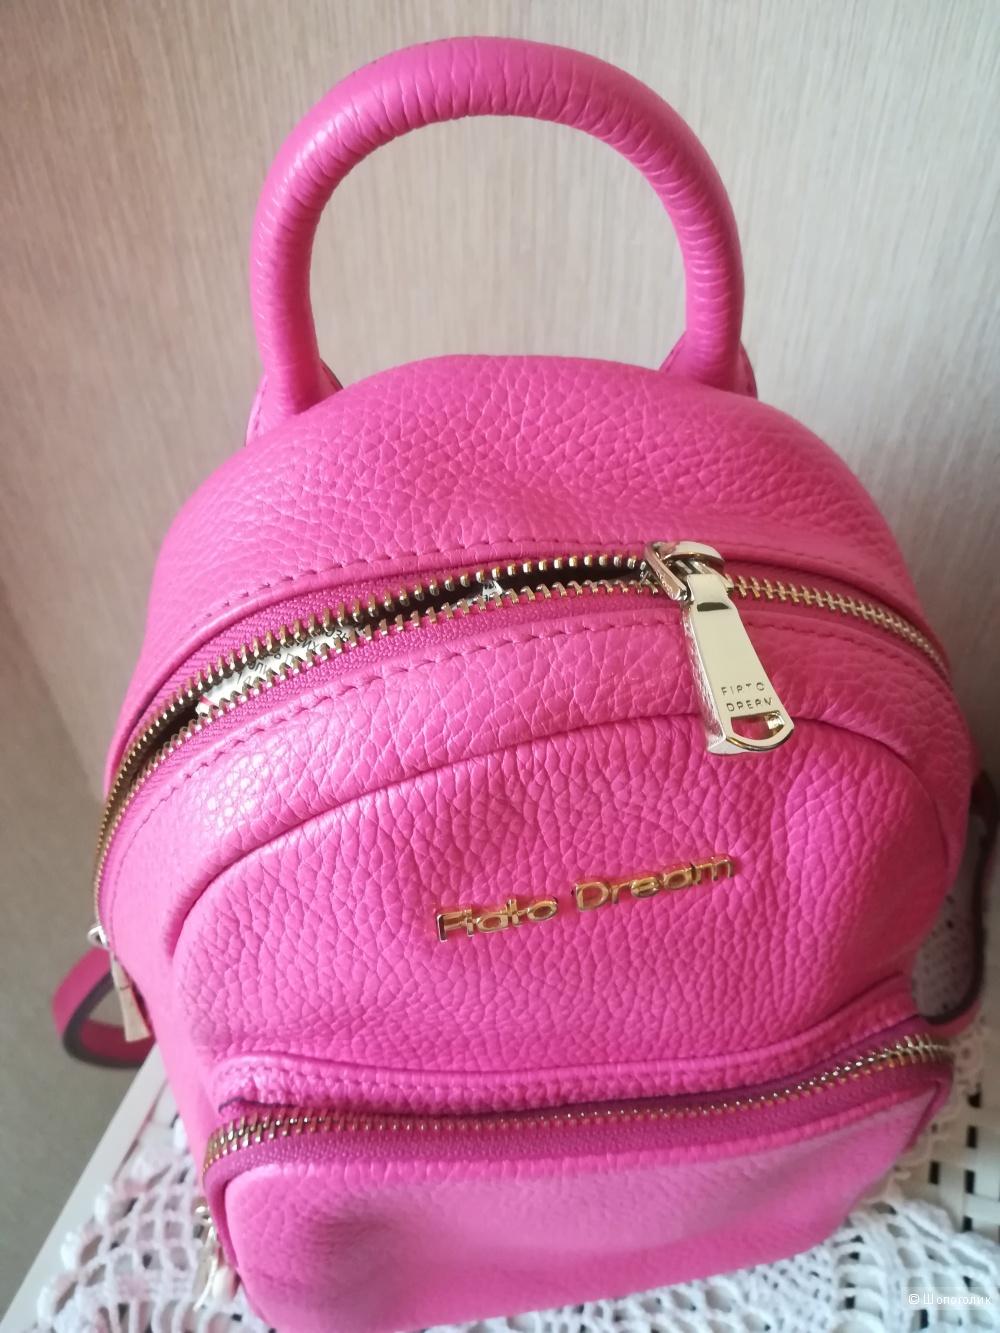 Рюкзак Fiato dream,19*23 (2 л)